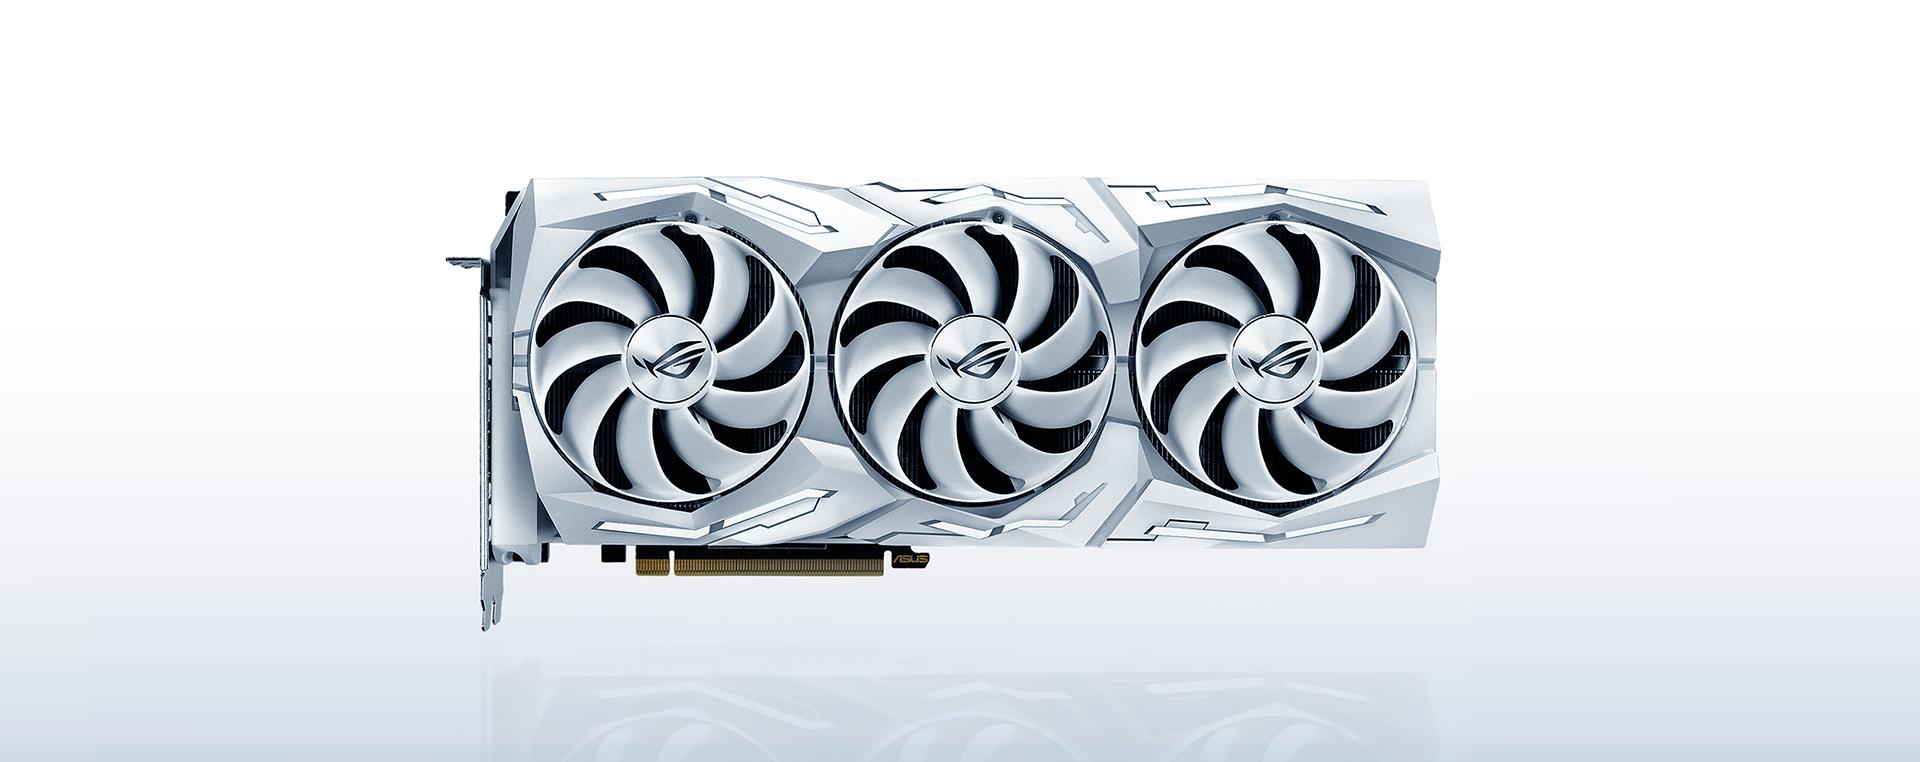 product kv เอซุสเปิดตัวการ์ดจอ ASUS GeForce RTX 2080 SUPER STRIX Snow White Edition รุ่นใหม่ล่าสุด